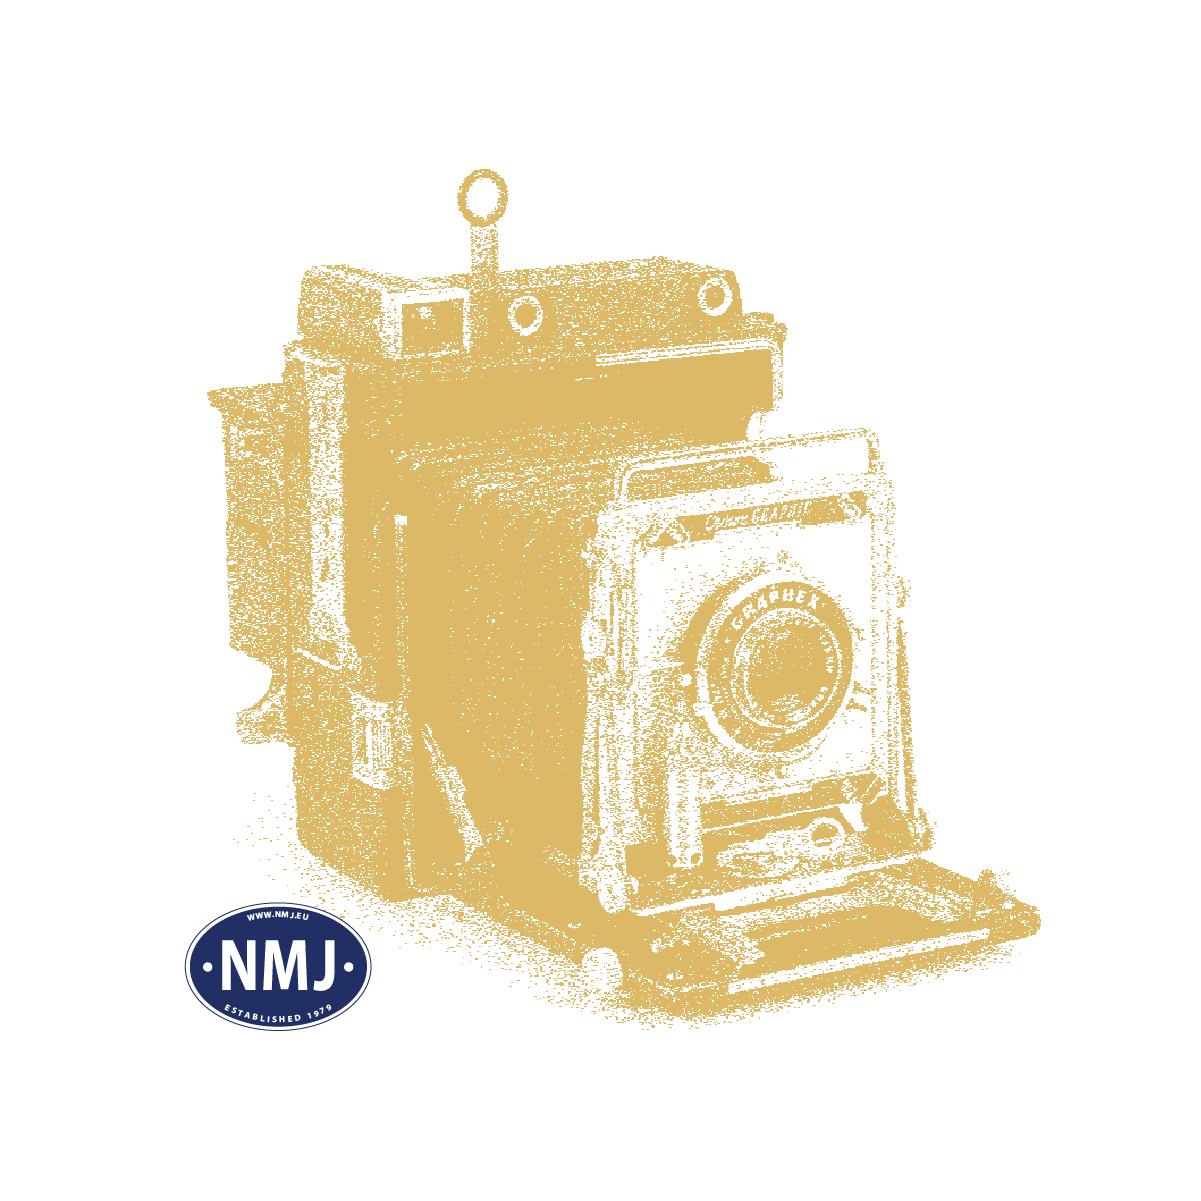 NMJH16107 - NMJ Skyline Rema 1000 Grocery Store, Kit